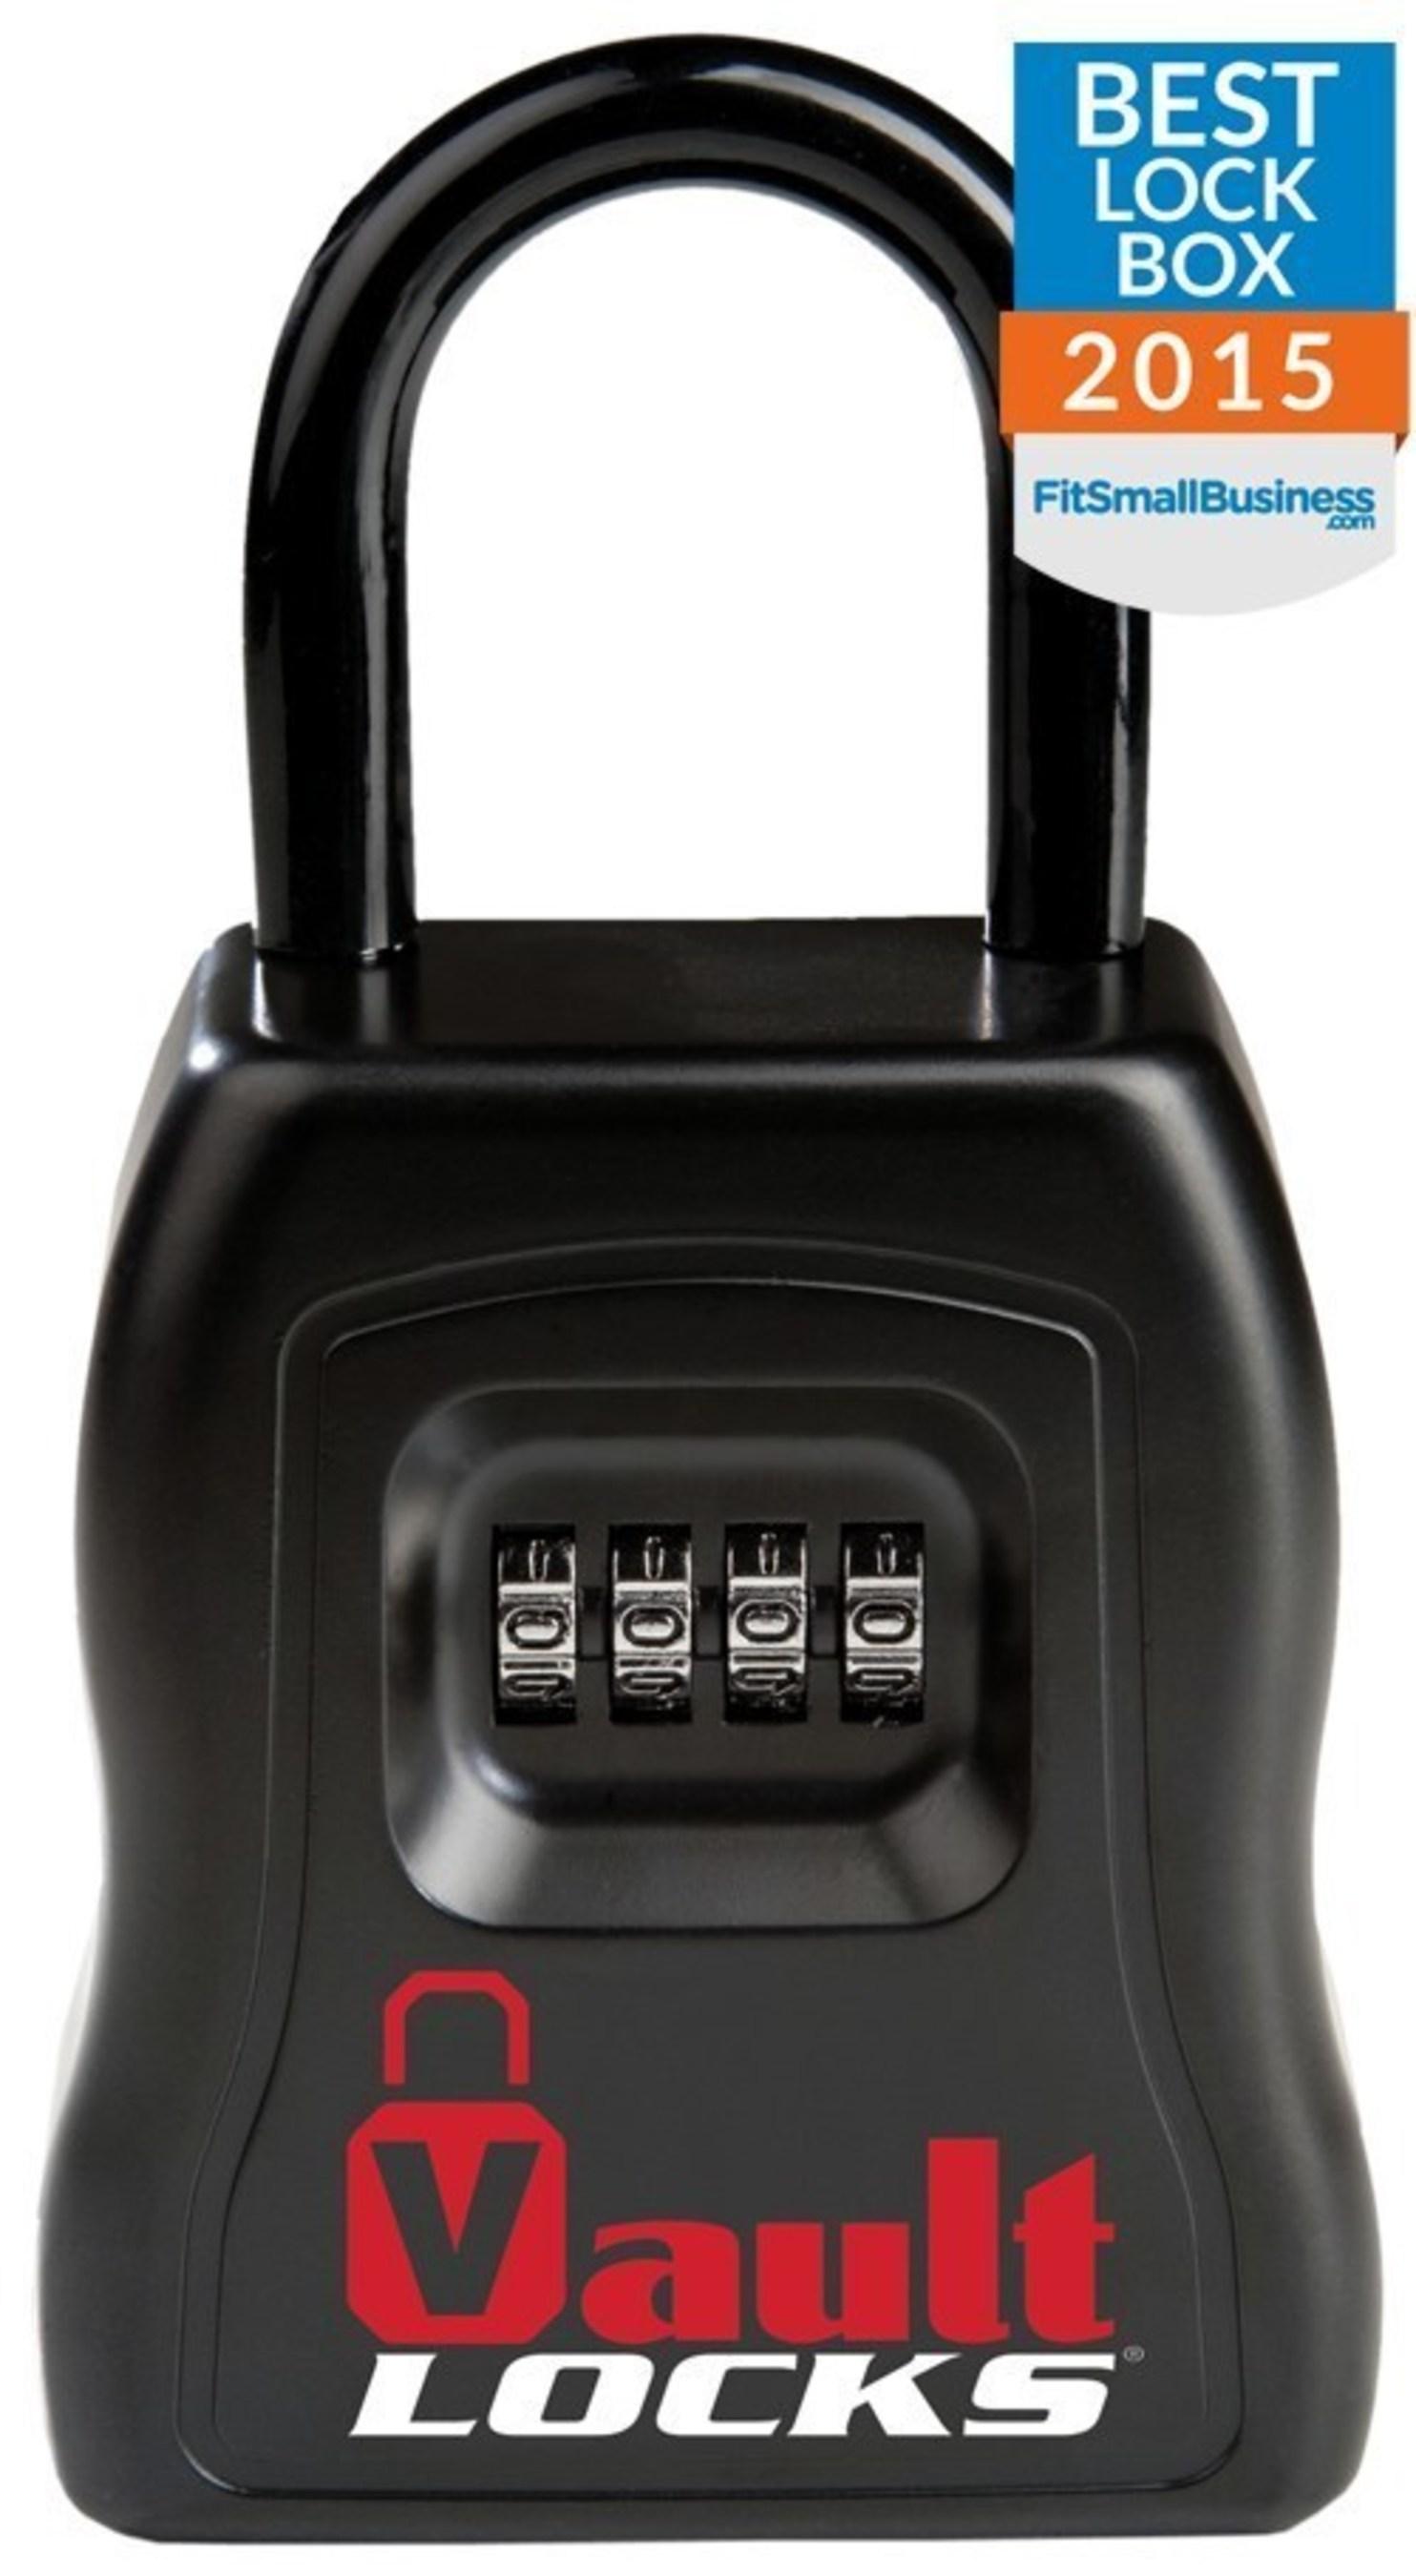 VaultLOCKS 5000 - Best Lock Box 2015